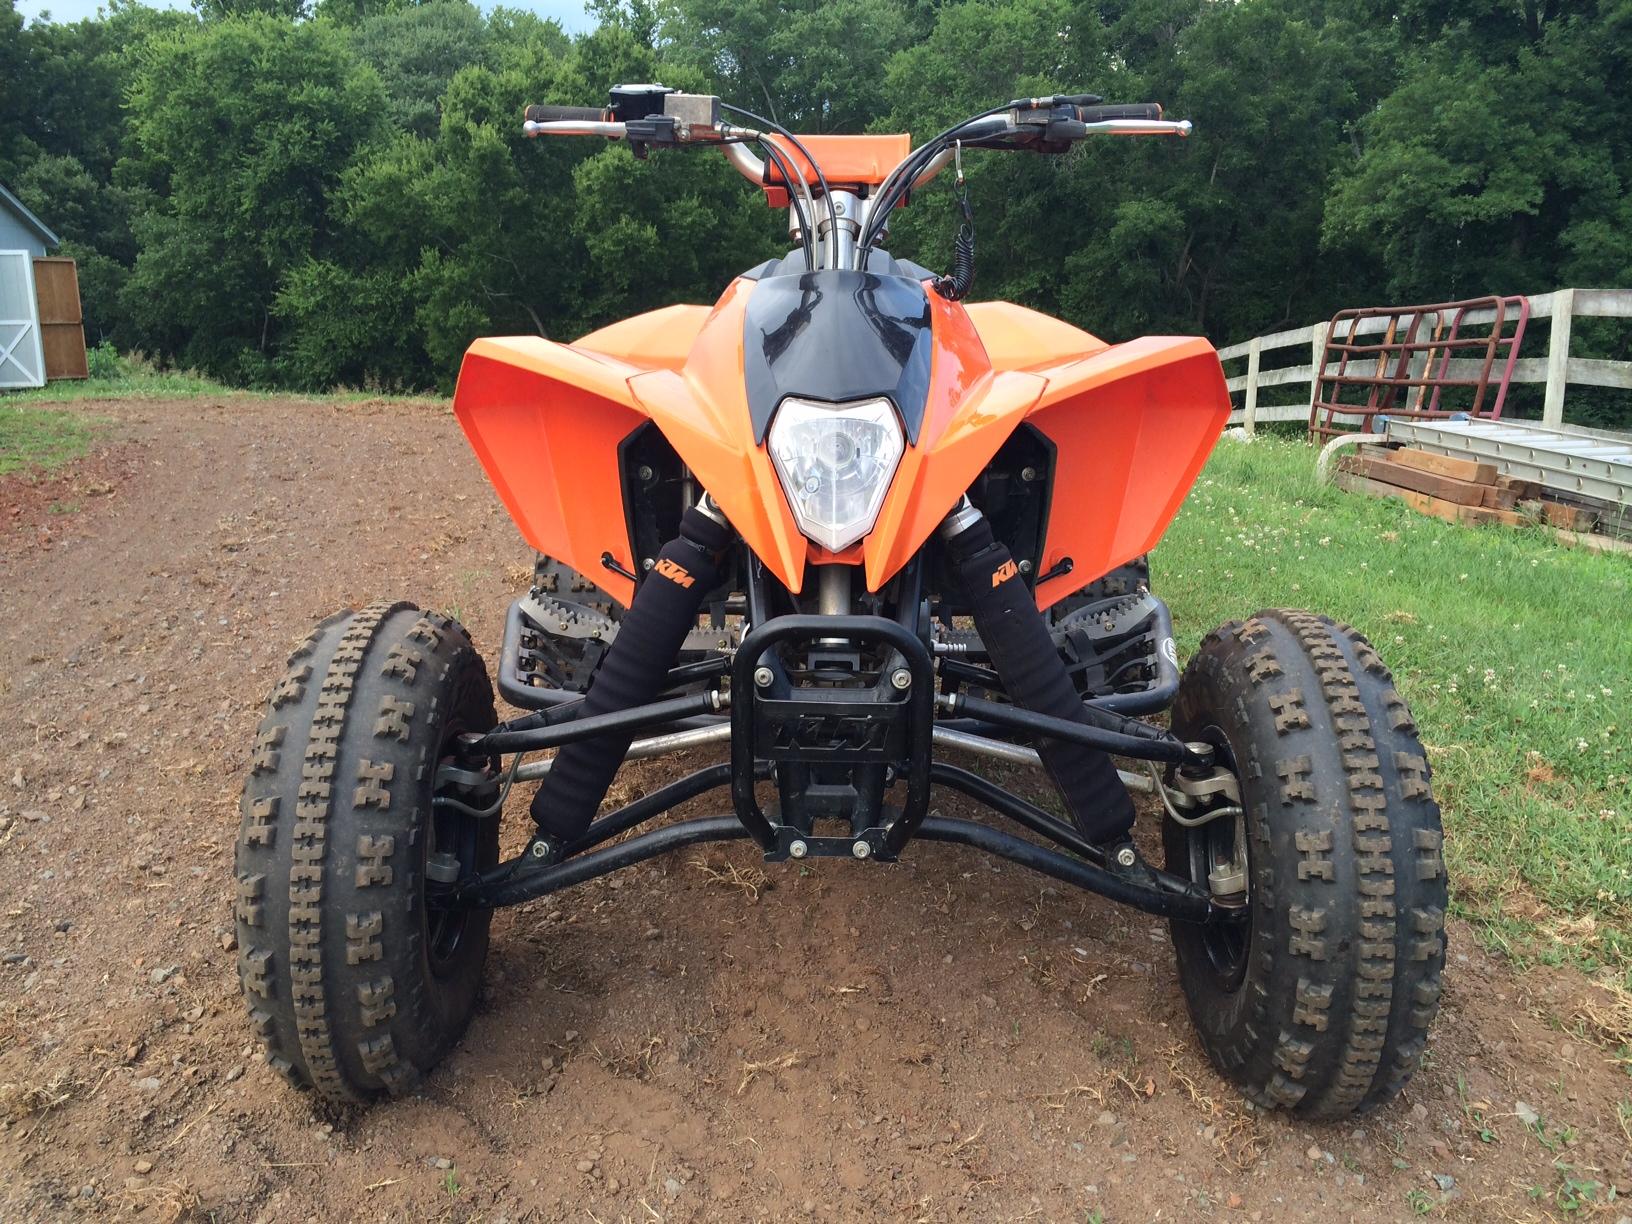 Used 2008 KTM 525 XC ATVs For Sale in Pennsylvania. | Ktm